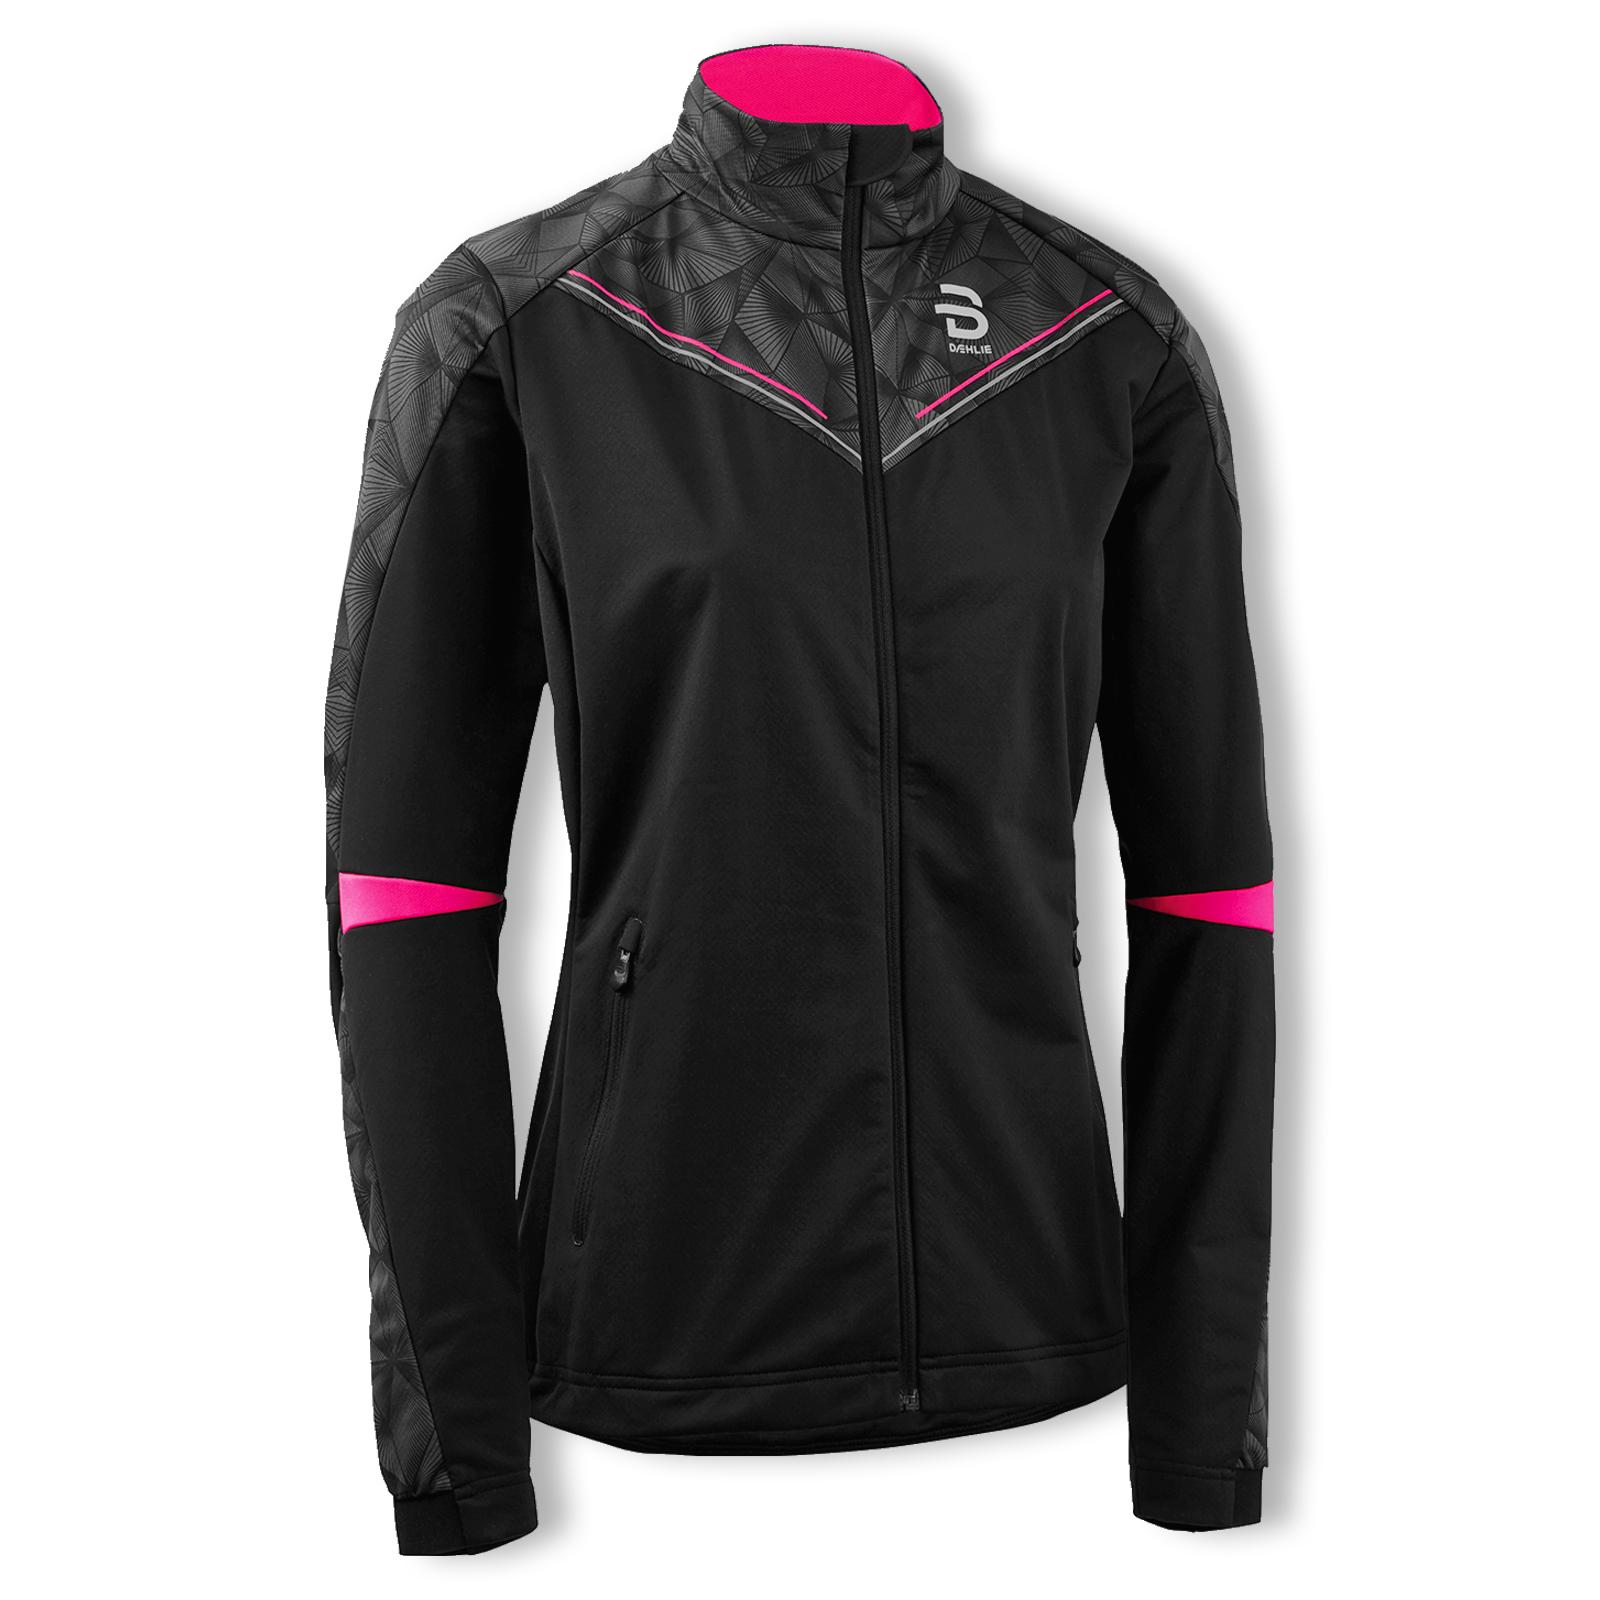 Björn Daehlie Damen Funktionsjacke Softshelljacke Jacket Intent Women S M L 332062 in schwarz